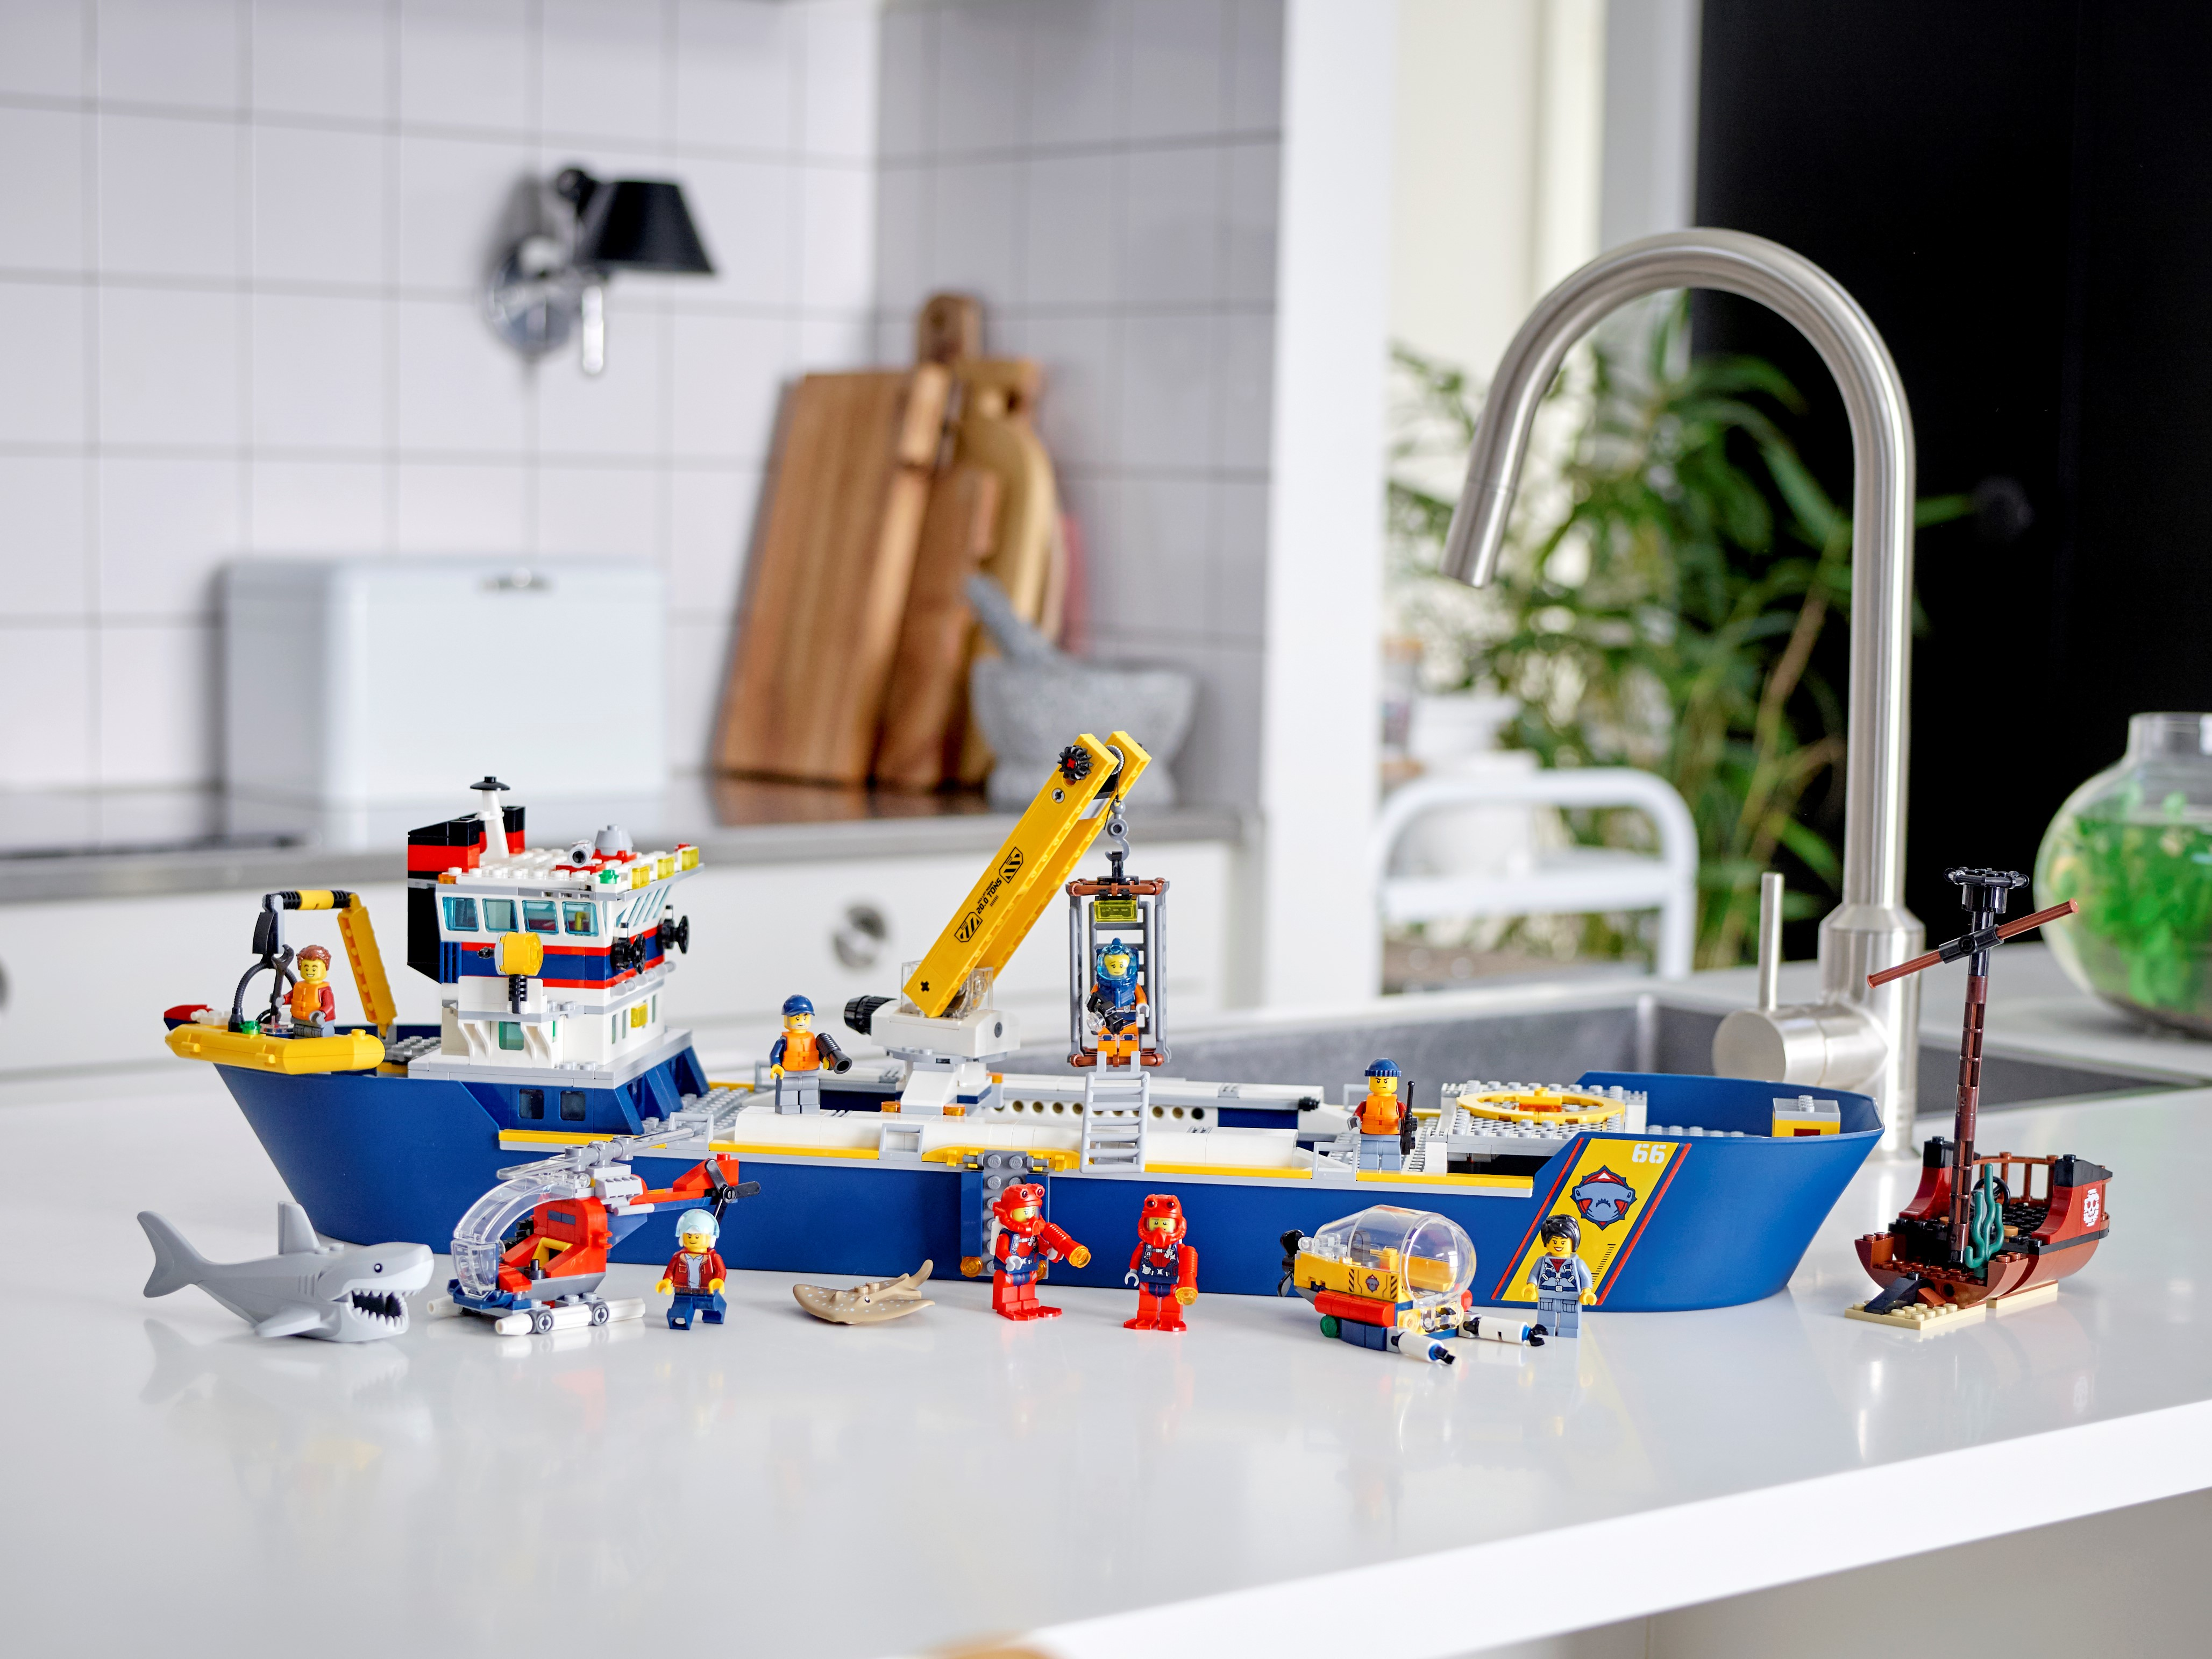 LEGO City 60266 Ocean Exploration Ship Building Kit New Release